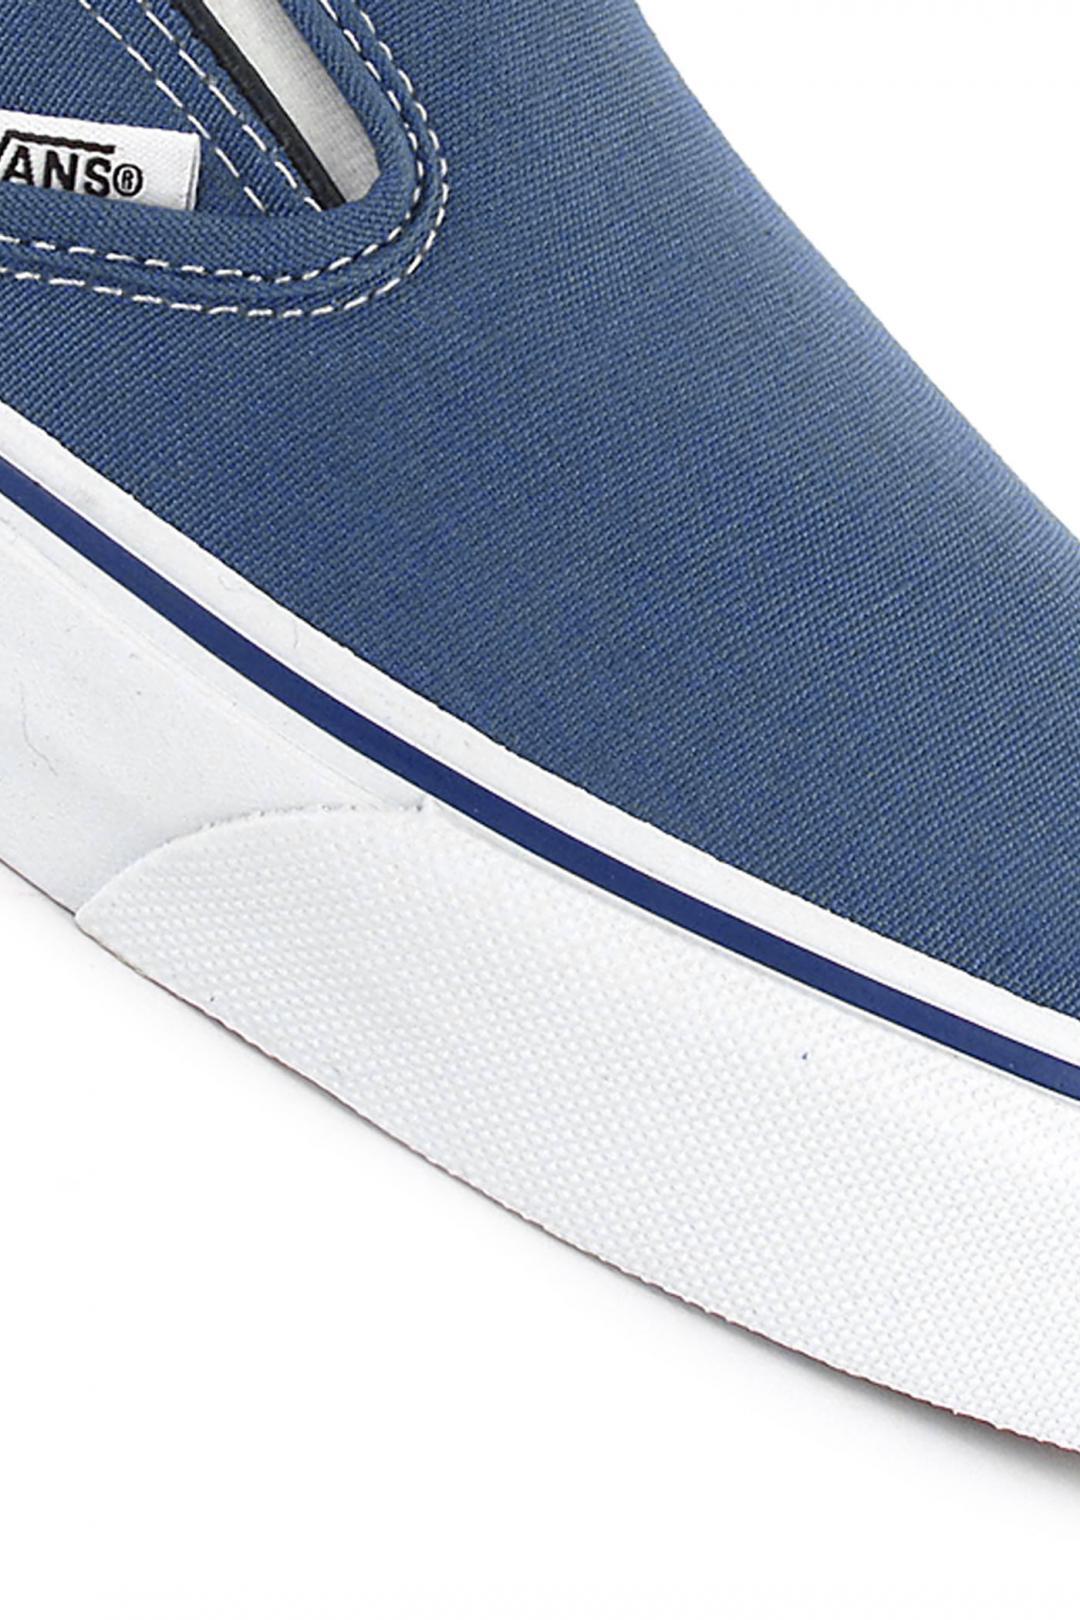 Uomo Vans Classic Slip-On navy | Sneakers slip on